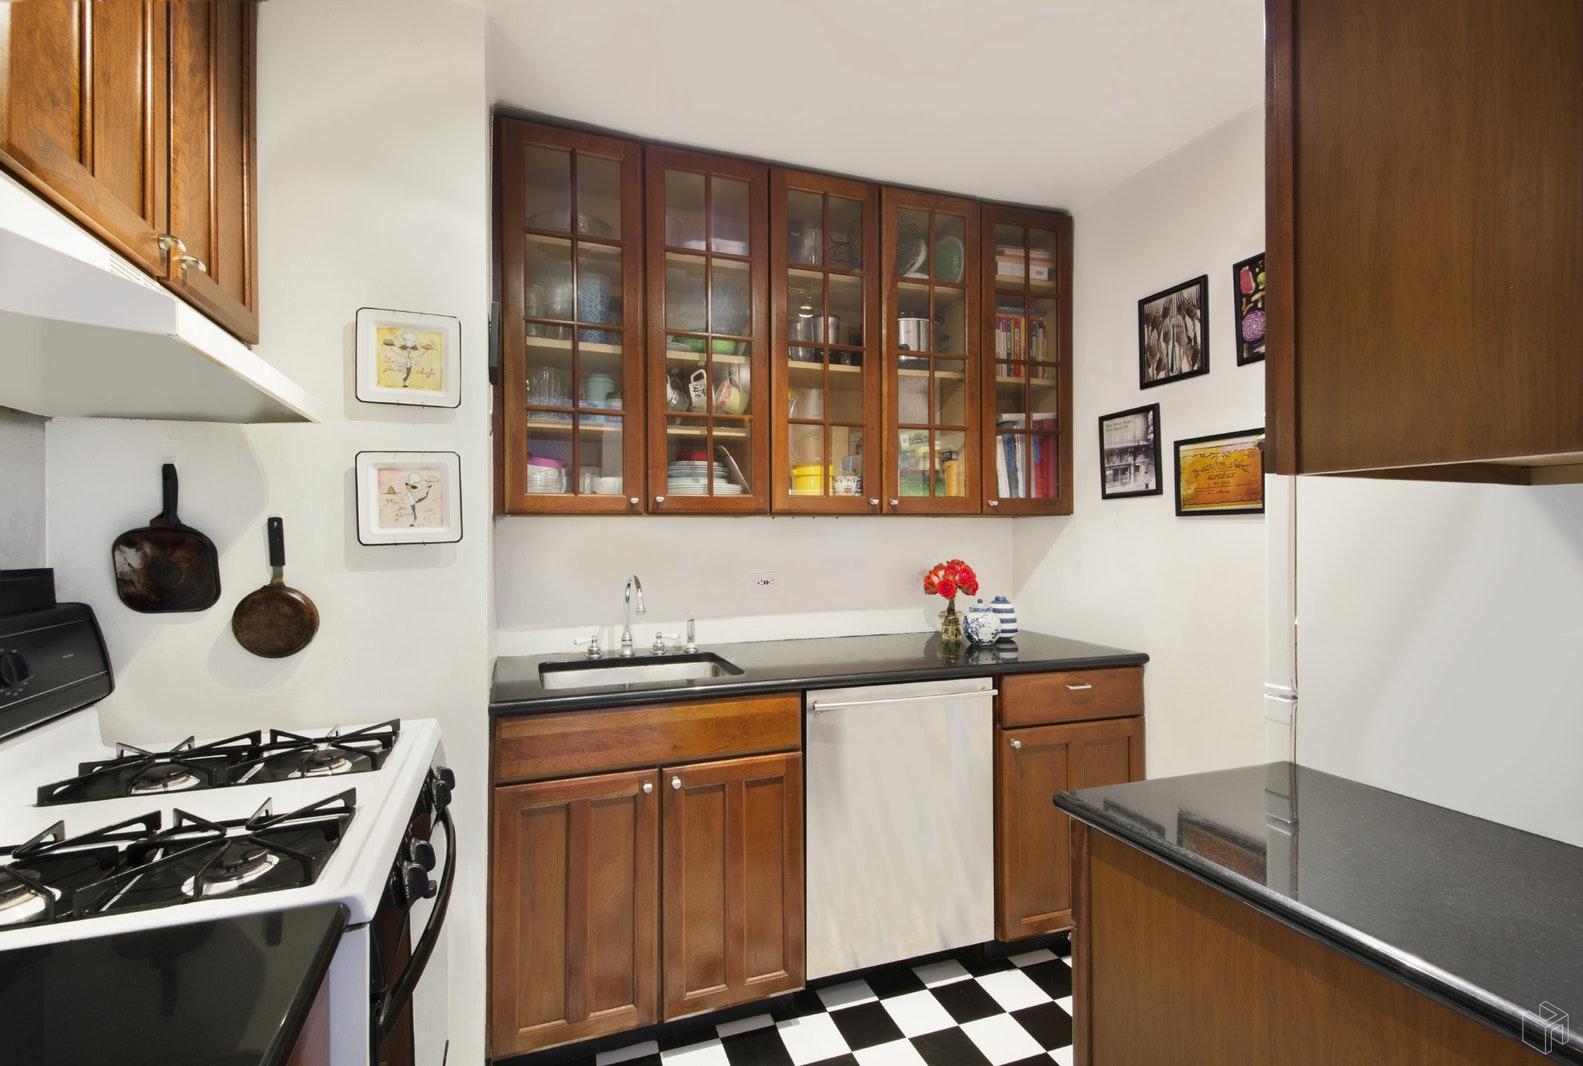 251 EAST 32ND STREET 8A, Murray Hill Kips Bay, $0, Web #: 19578527